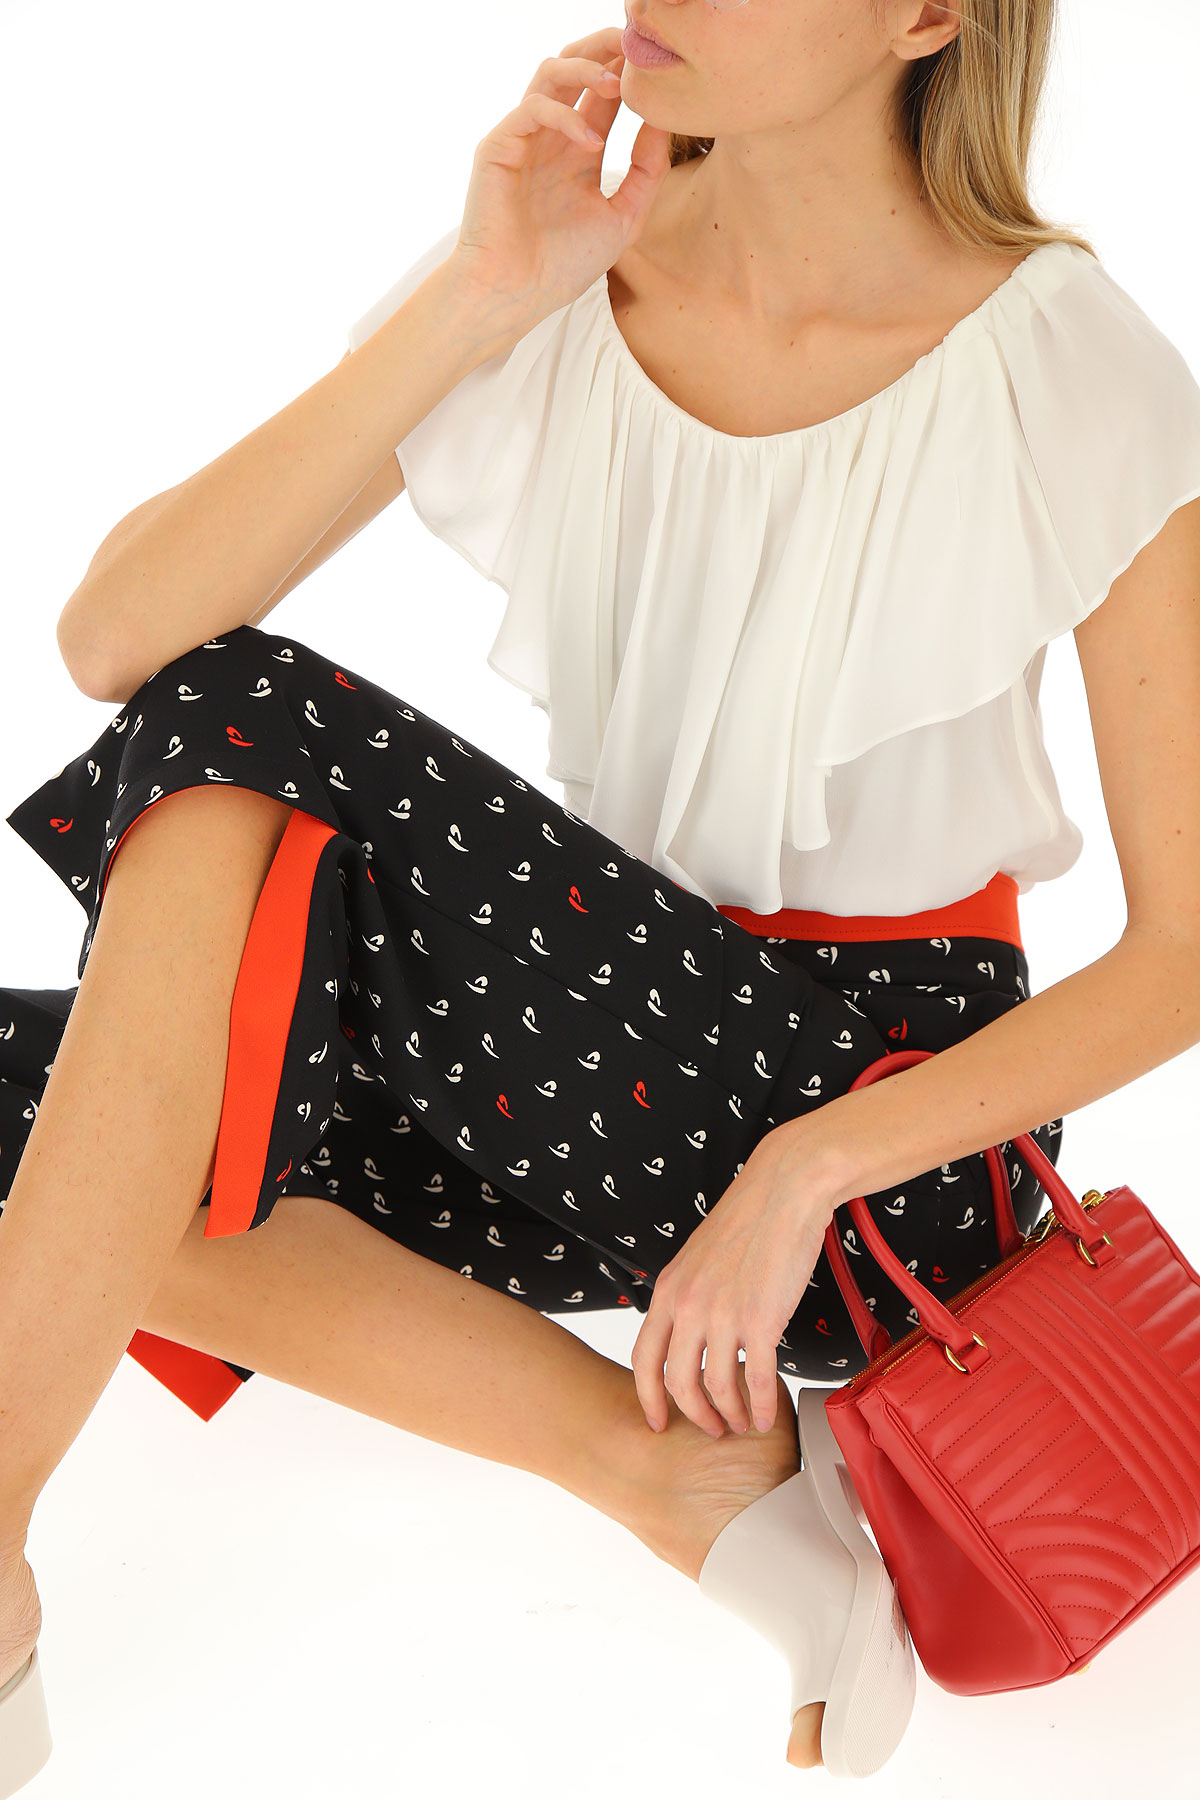 Primavera nbsp;blanco Ropa Pinko 2019 Rojo Mujer Negro Para verano RCFtqxwC